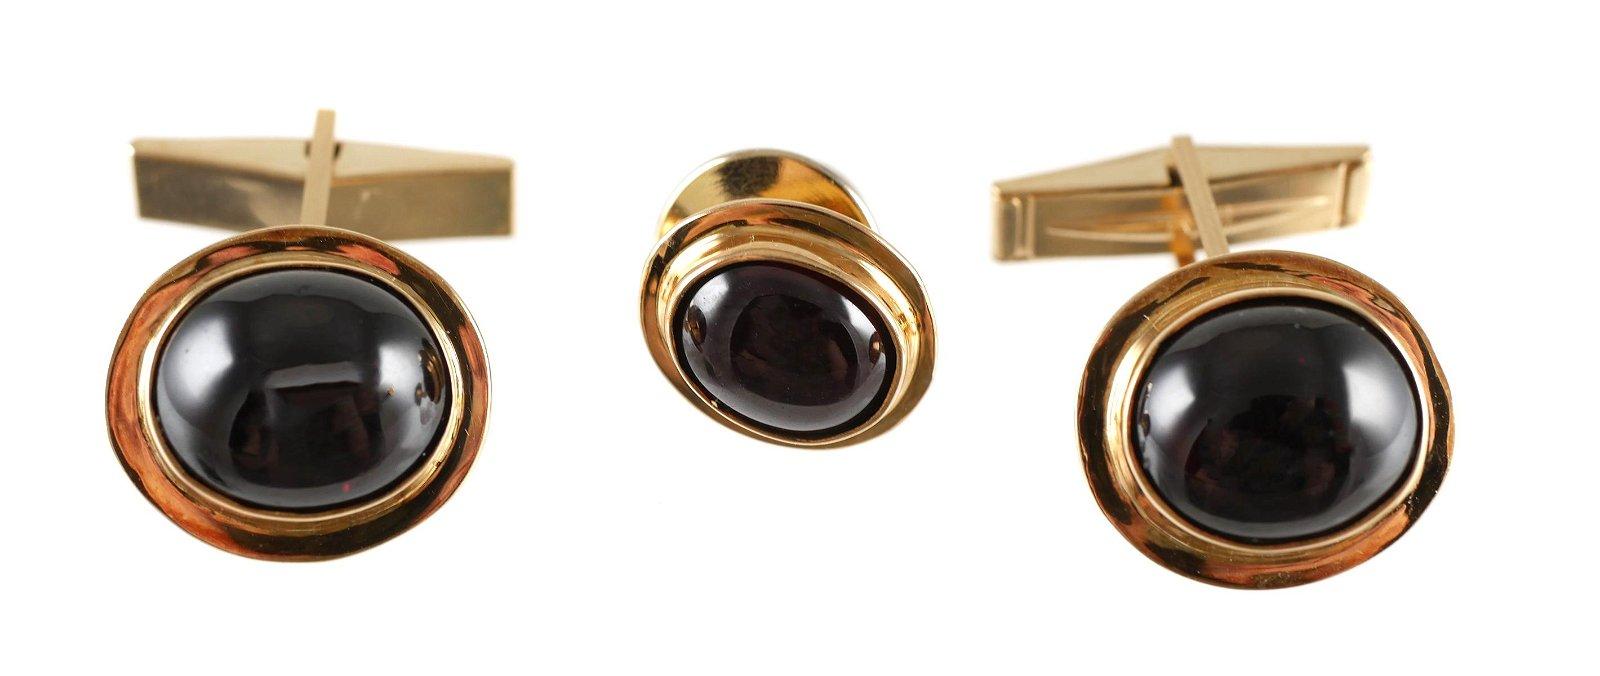 Pair 14K Gold & Almandite Cufflinks with Tie Tack